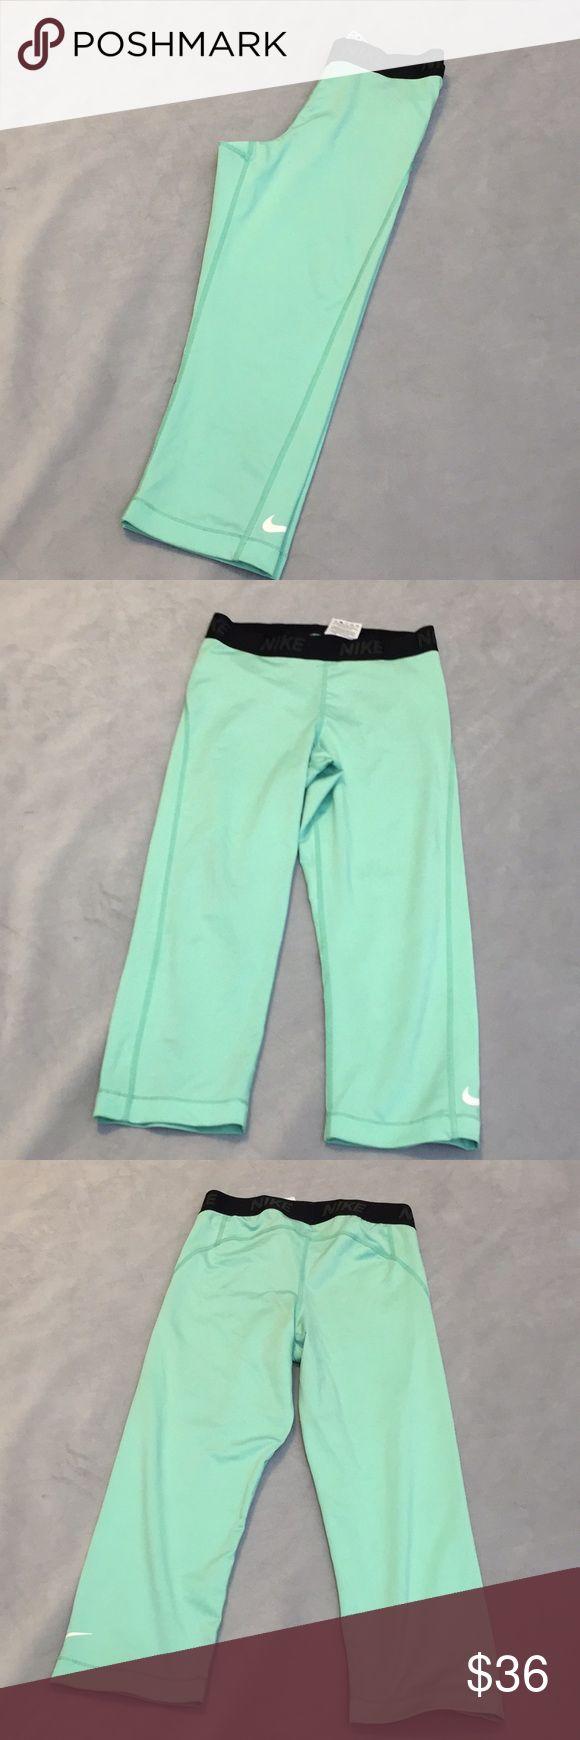 "NIKE mint Capri pants sz Small NIKE mint Capri pants sz Small. Excellent used condition. 25"" length, 17"" inseam. Nike Pants Capris"